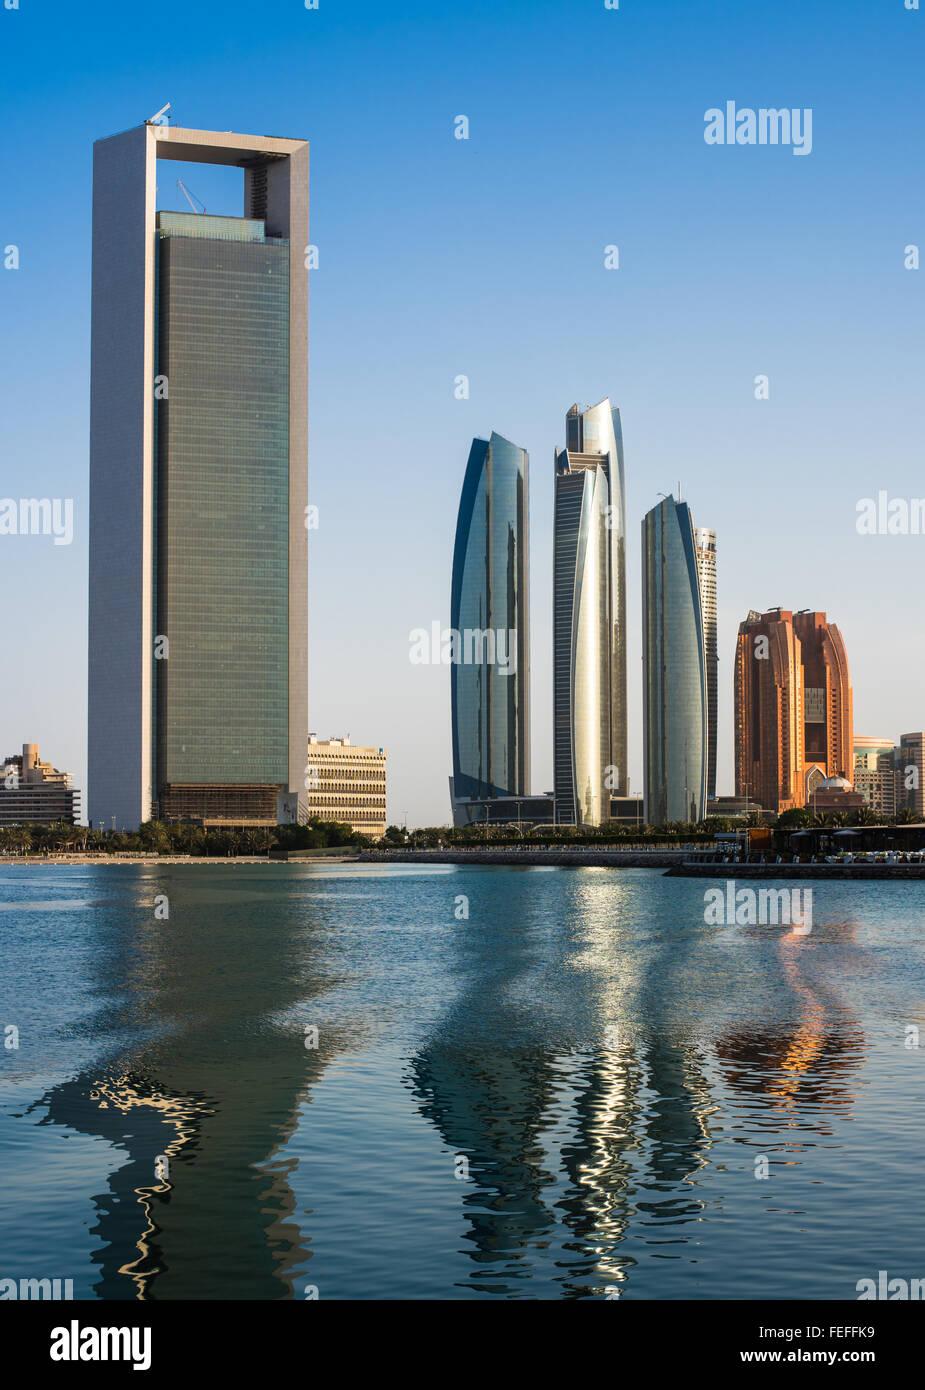 ADNOC and Jumeirah Etihad Towers at dusk, Abu Dhabi - Stock Image